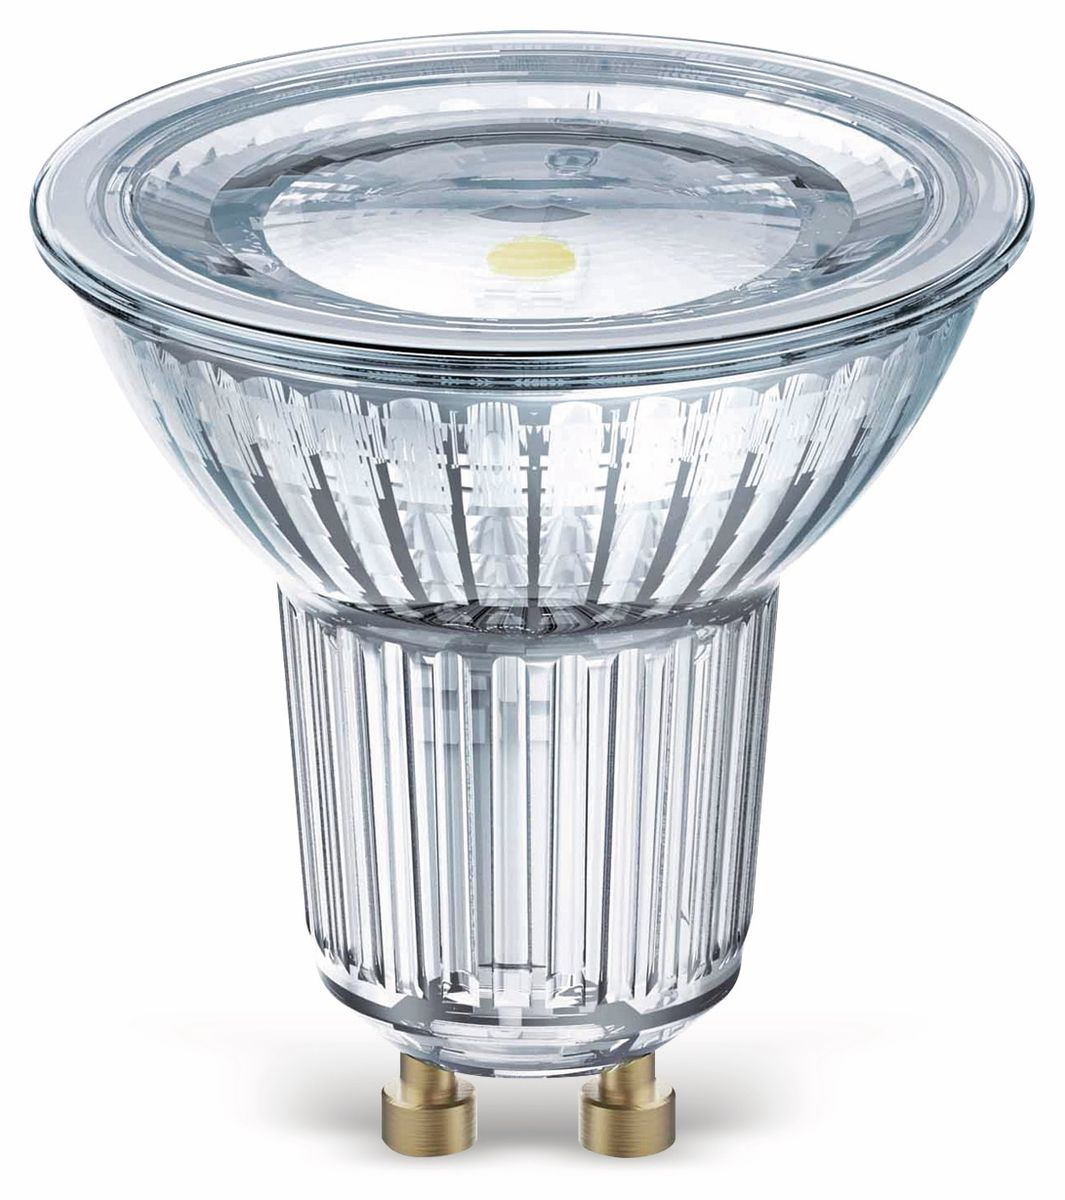 Osram Led Star Par16 : led lampe osram led star par16 gu10 eek a 4 3 w 330 lm 4000 k online kaufen ~ Watch28wear.com Haus und Dekorationen